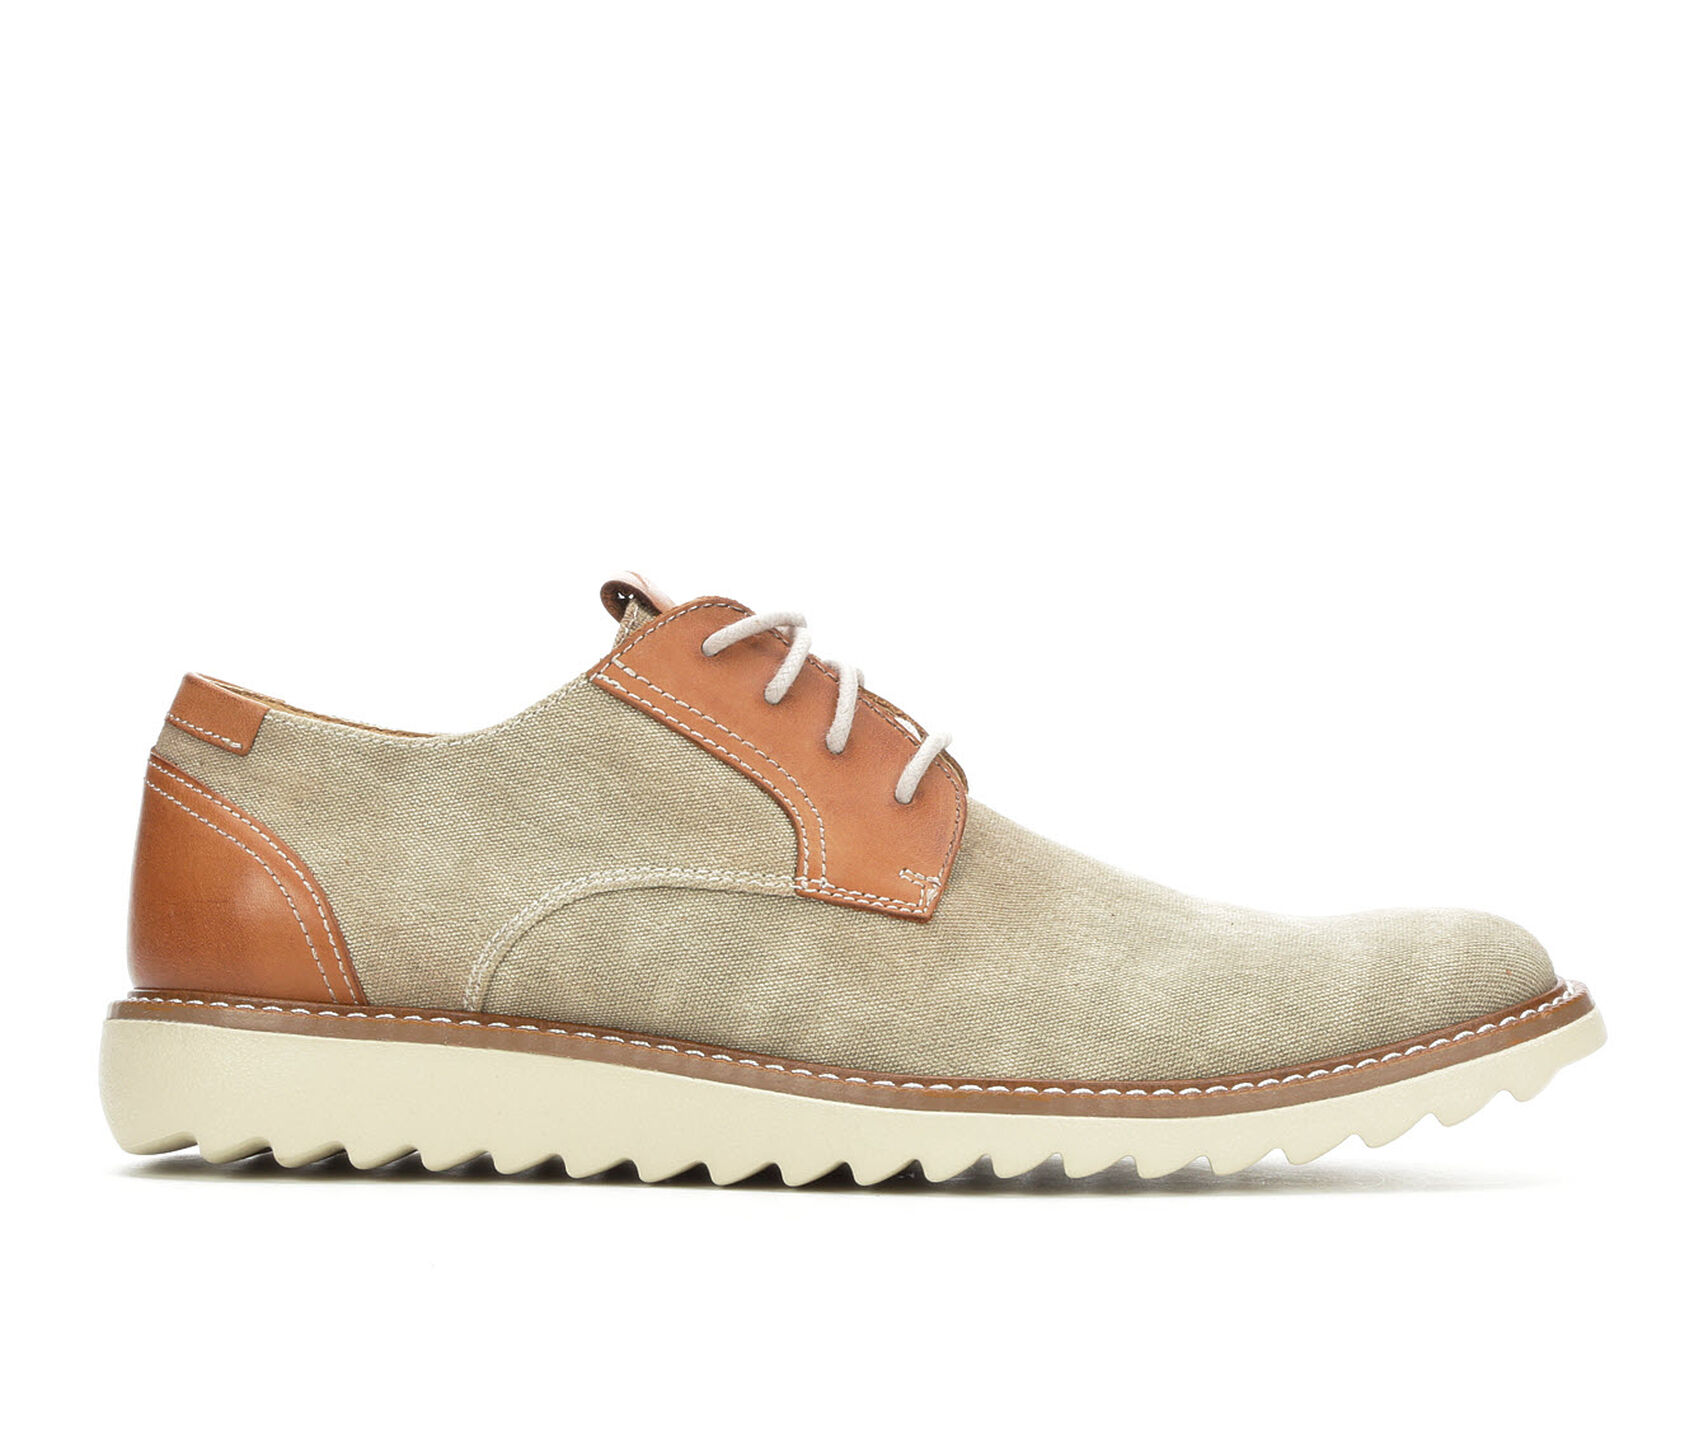 88130b2777 Men s Dockers Edison Dress Shoes